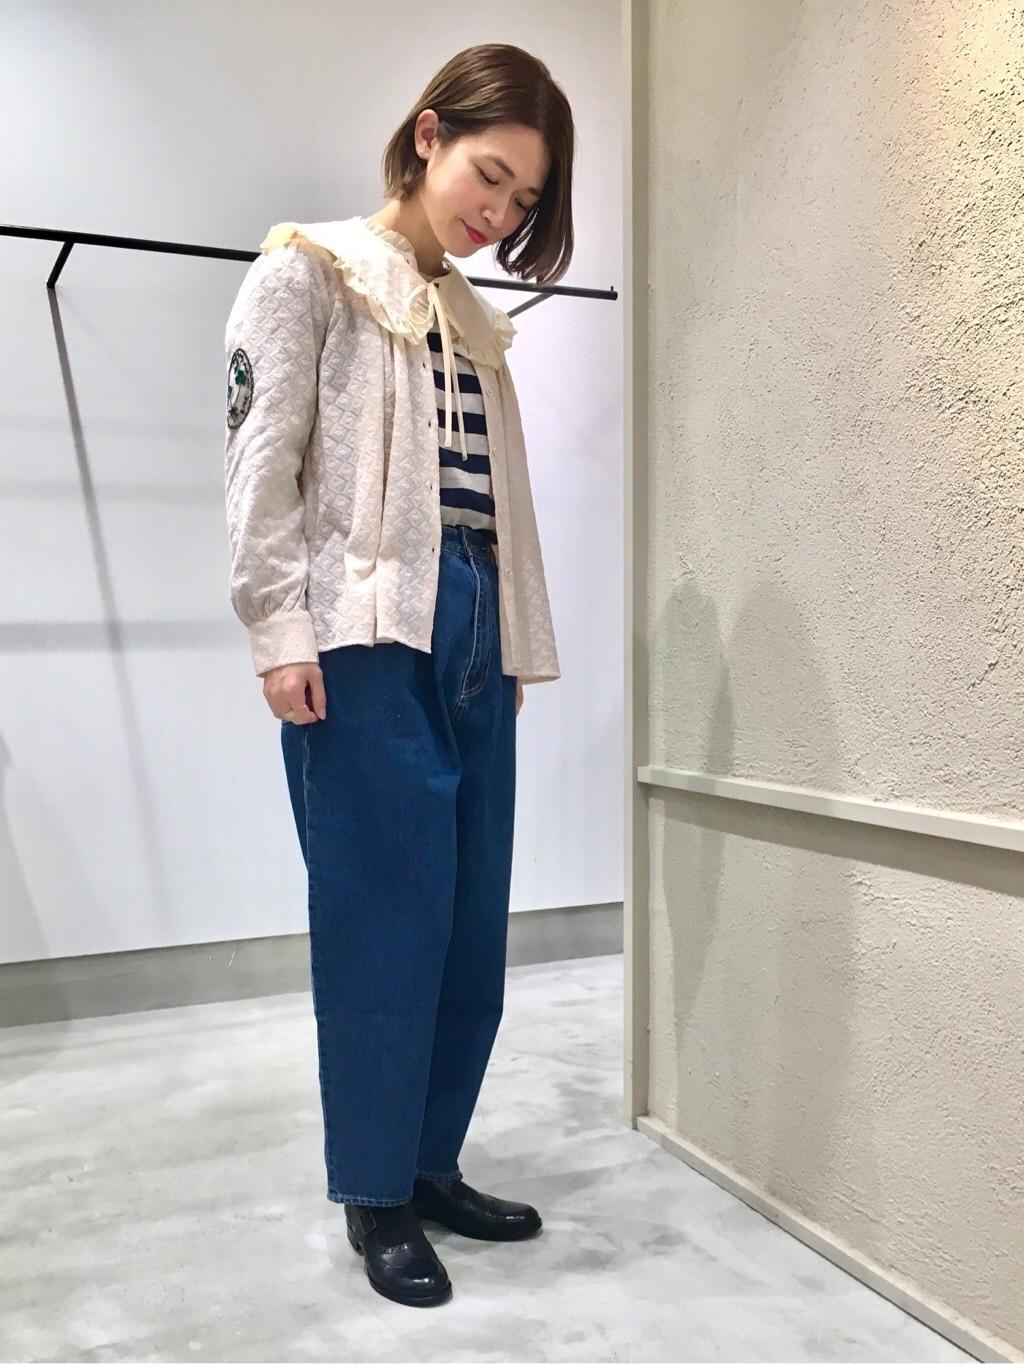 chambre de charme 横浜ジョイナス 身長:160cm 2021.01.10